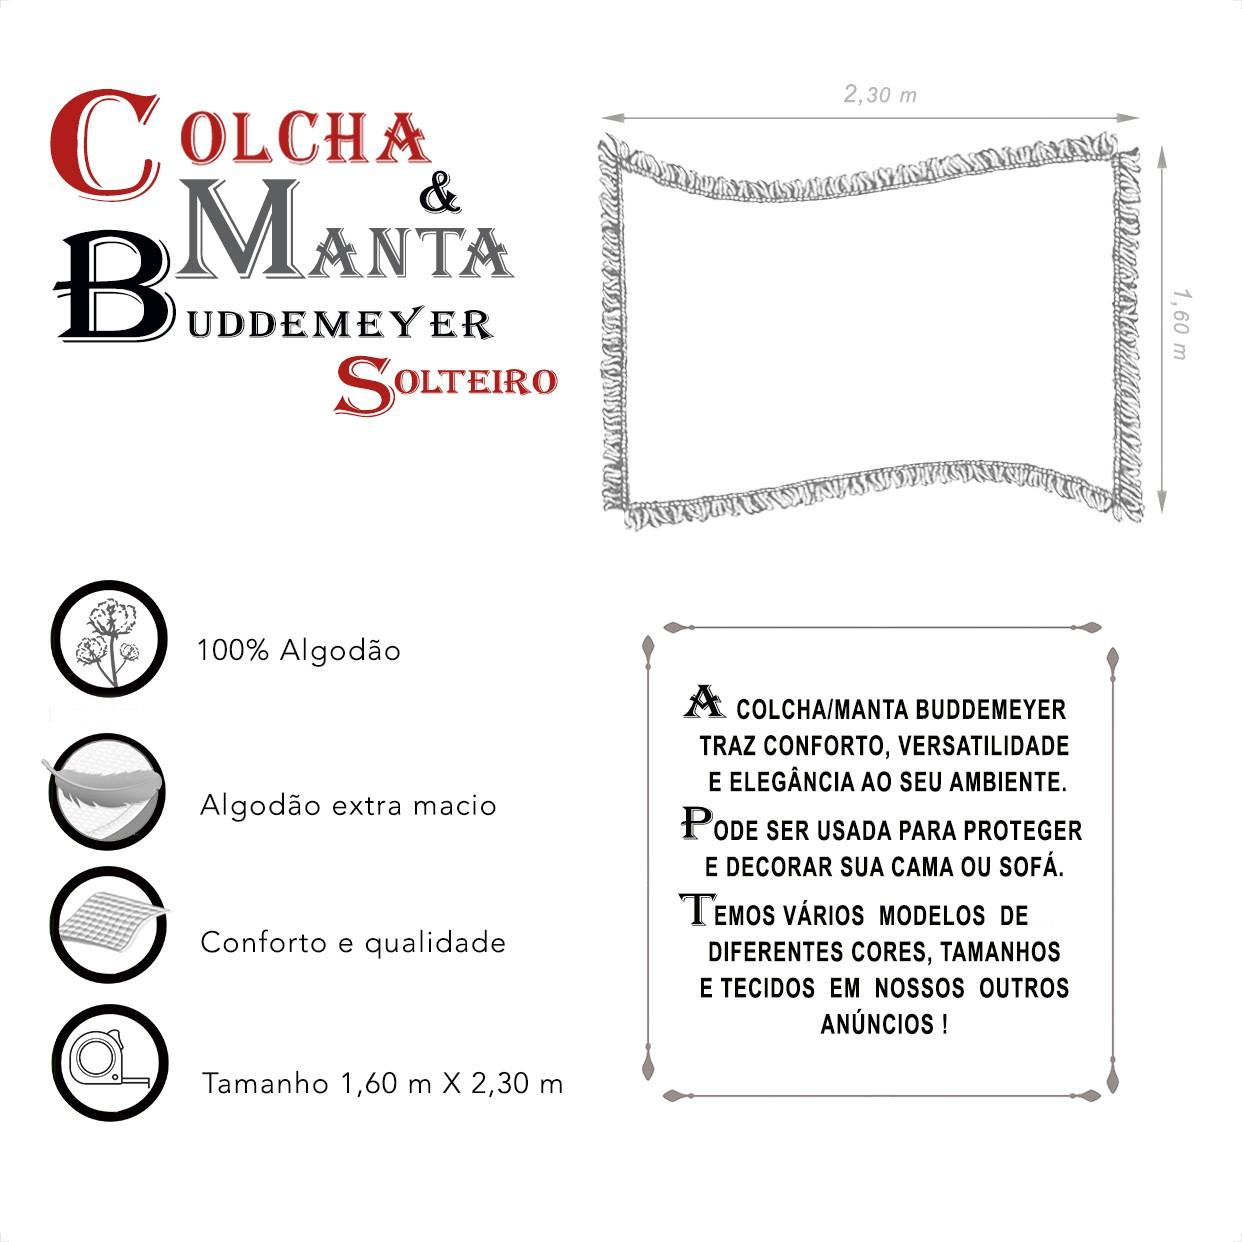 Manta e Colcha Buddemeyer Solteiro Crua 1,60m x 2,30m